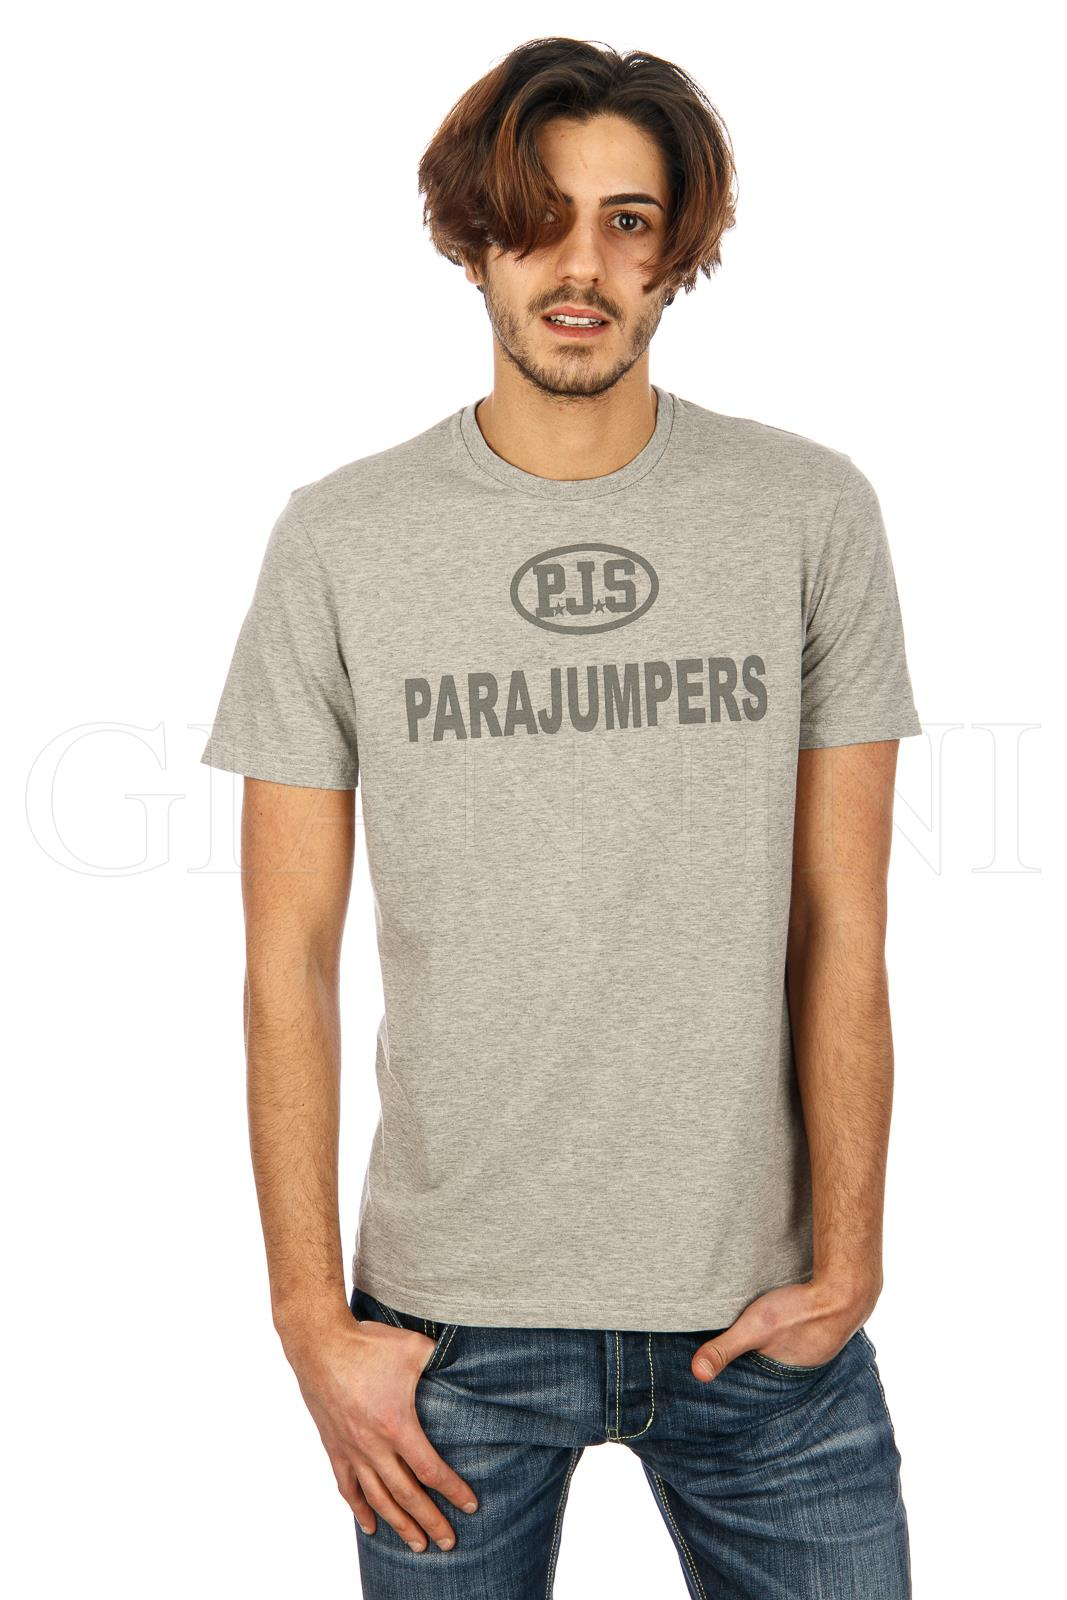 parajumpers t shirt